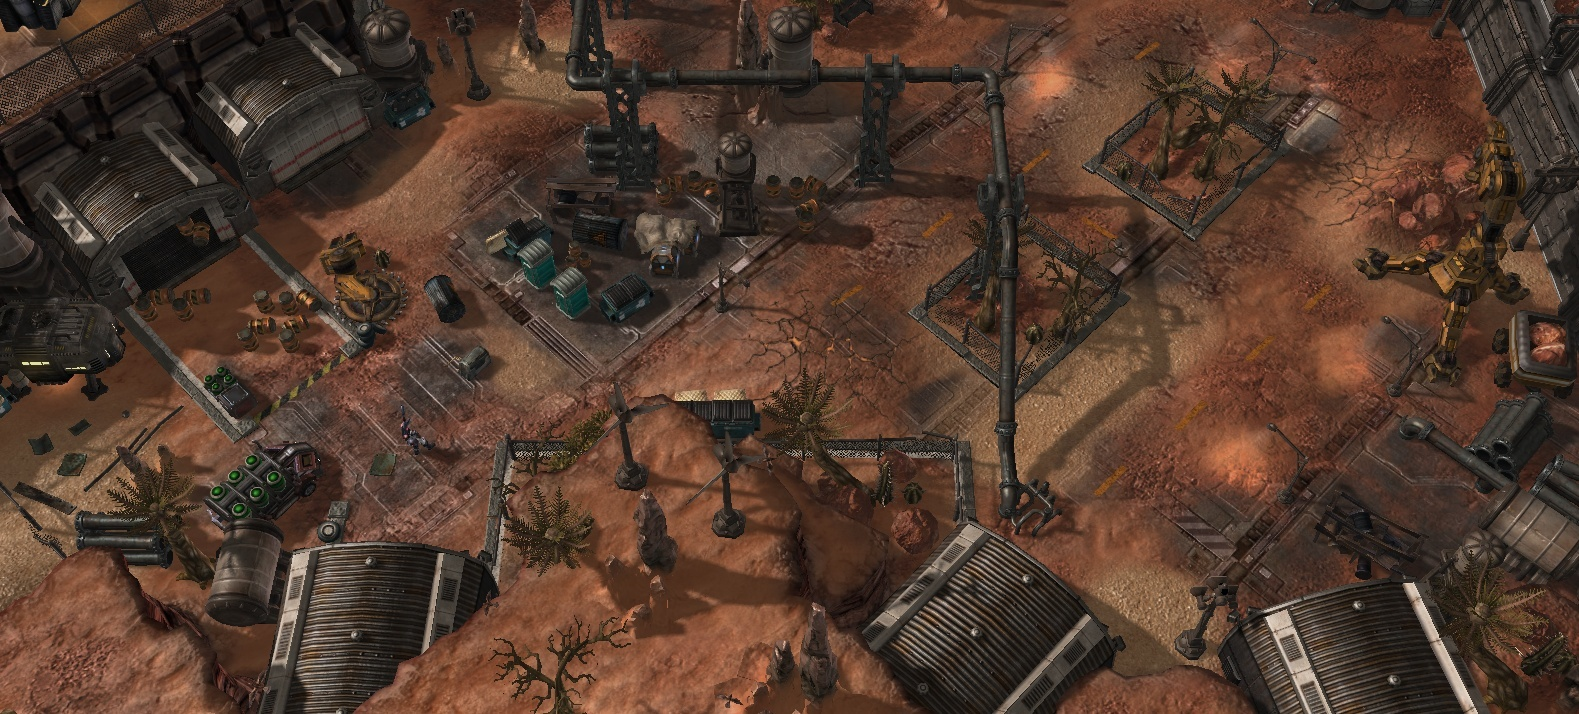 http://xgm.guru/p/sc2/terrain-wasteland